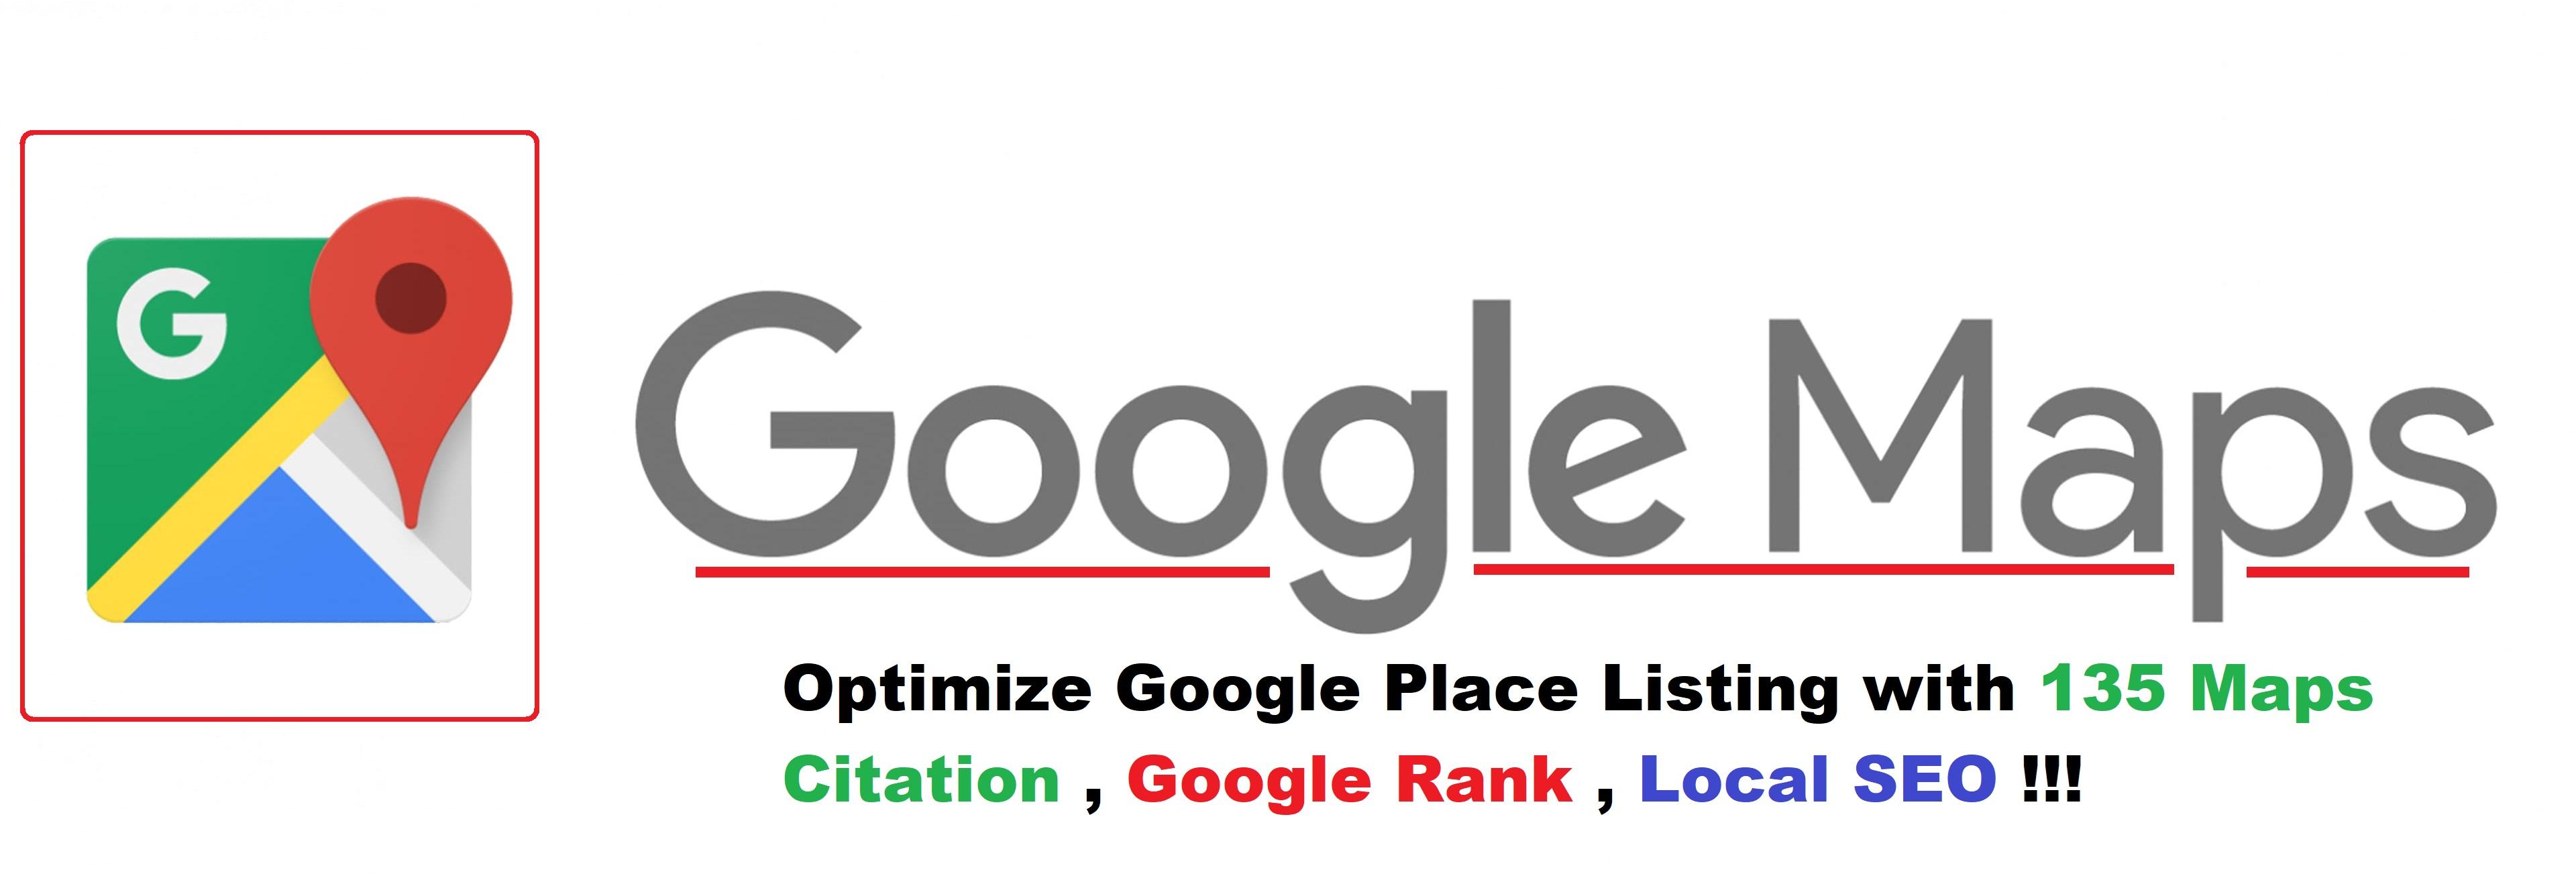 Optimize Google Place Listing with 135 Maps Citation, Google Rank, SEO